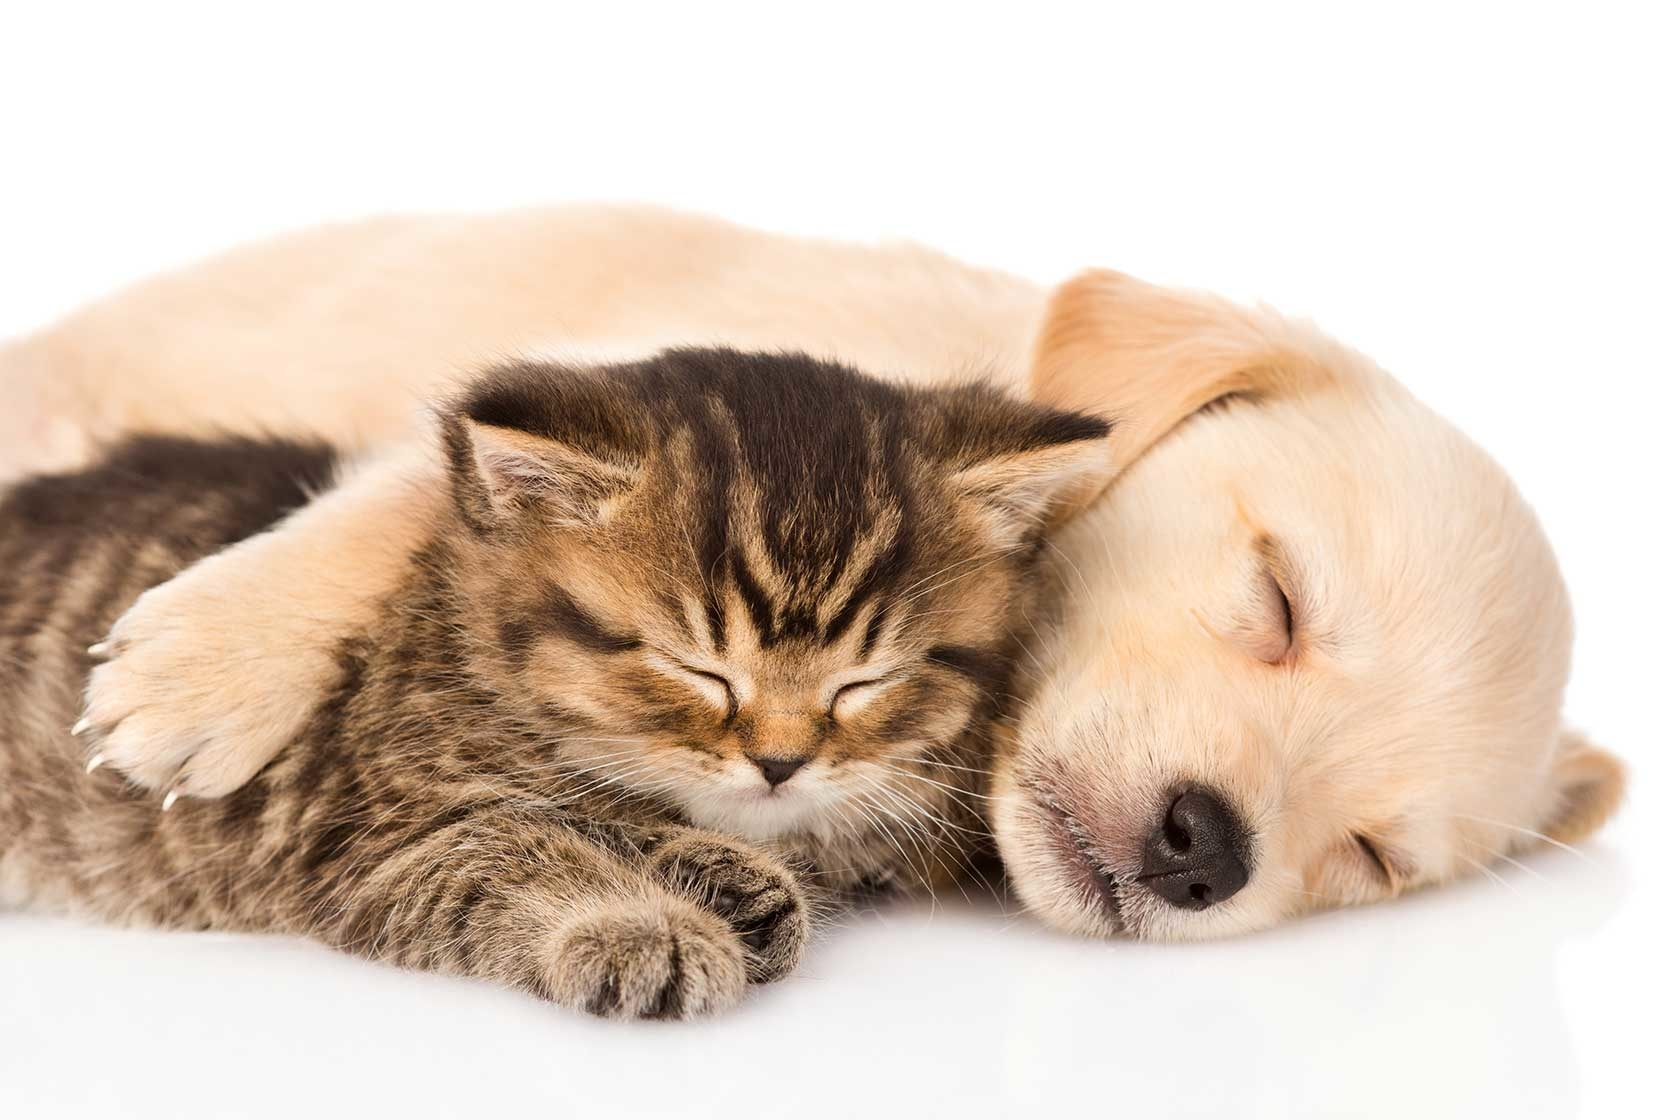 Greenwich Veterinary Services Brantford (519)758-1100